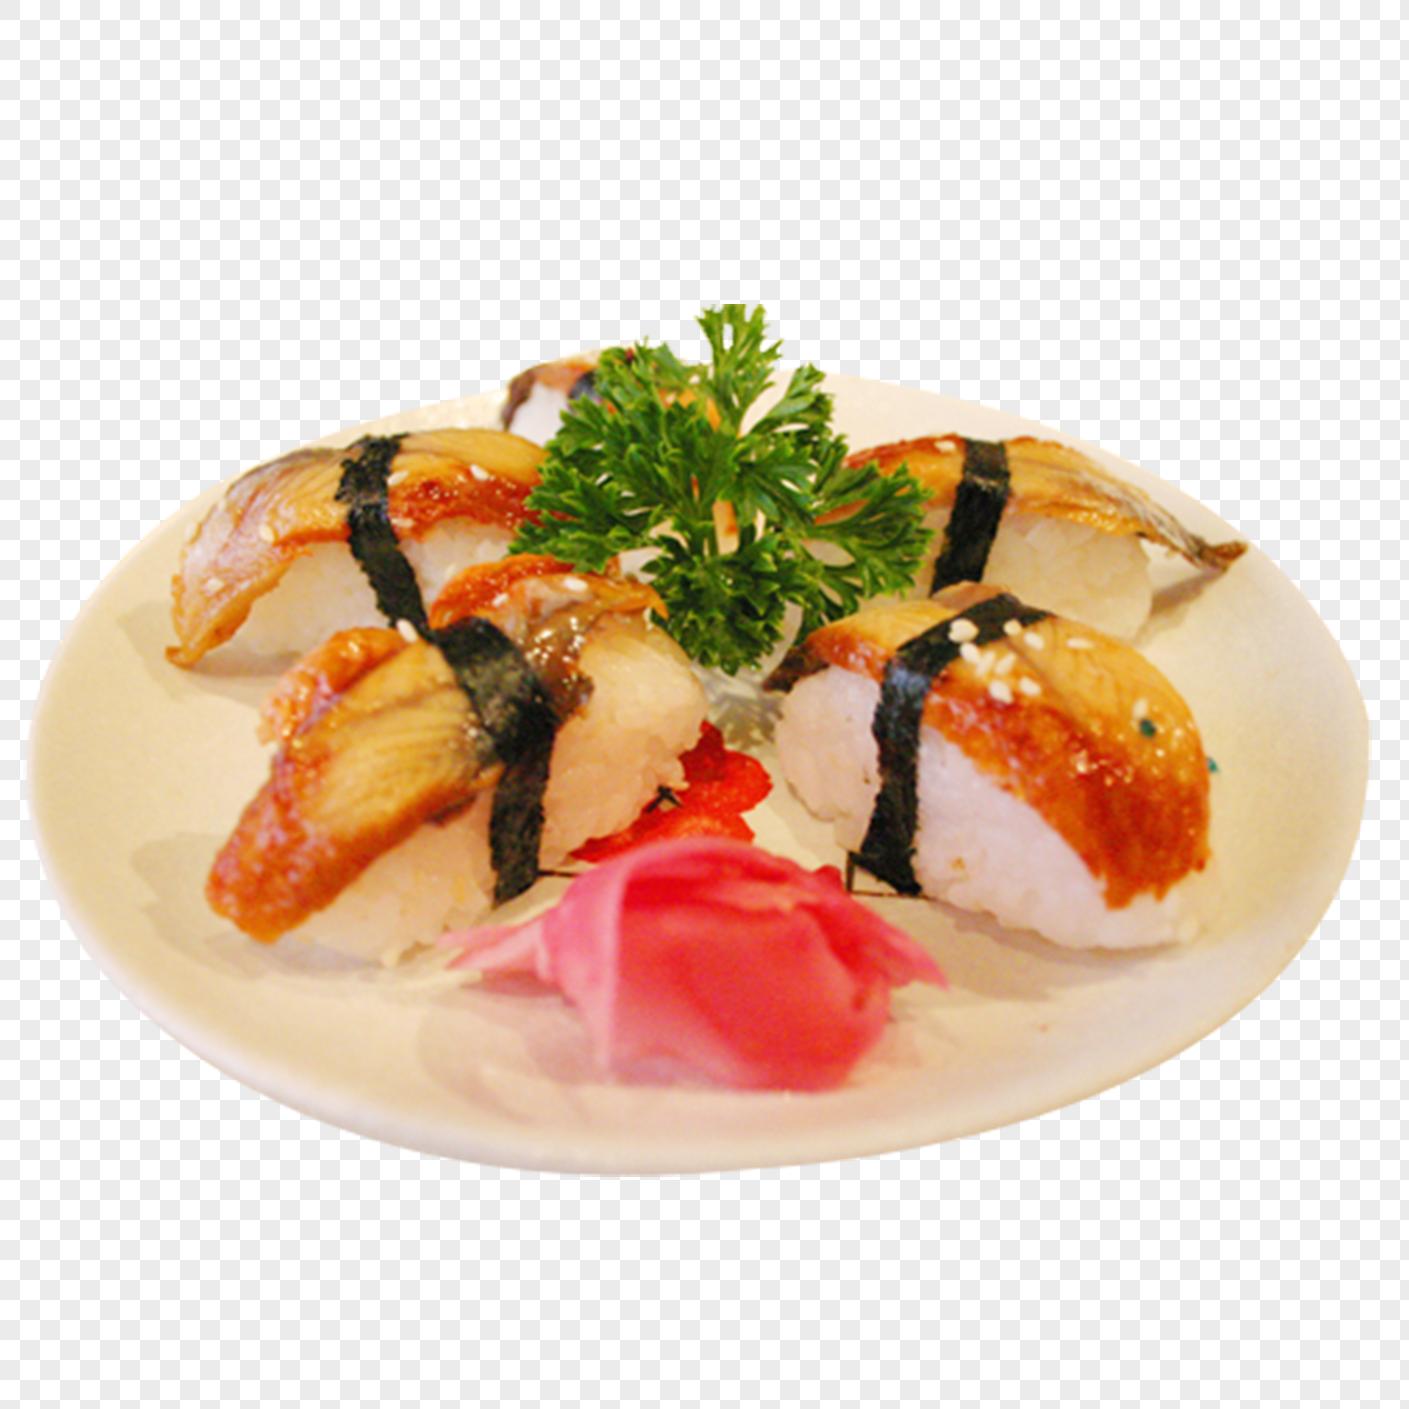 Pink Flower Eel Sushi Restaurant Food Png Imagepicture Free